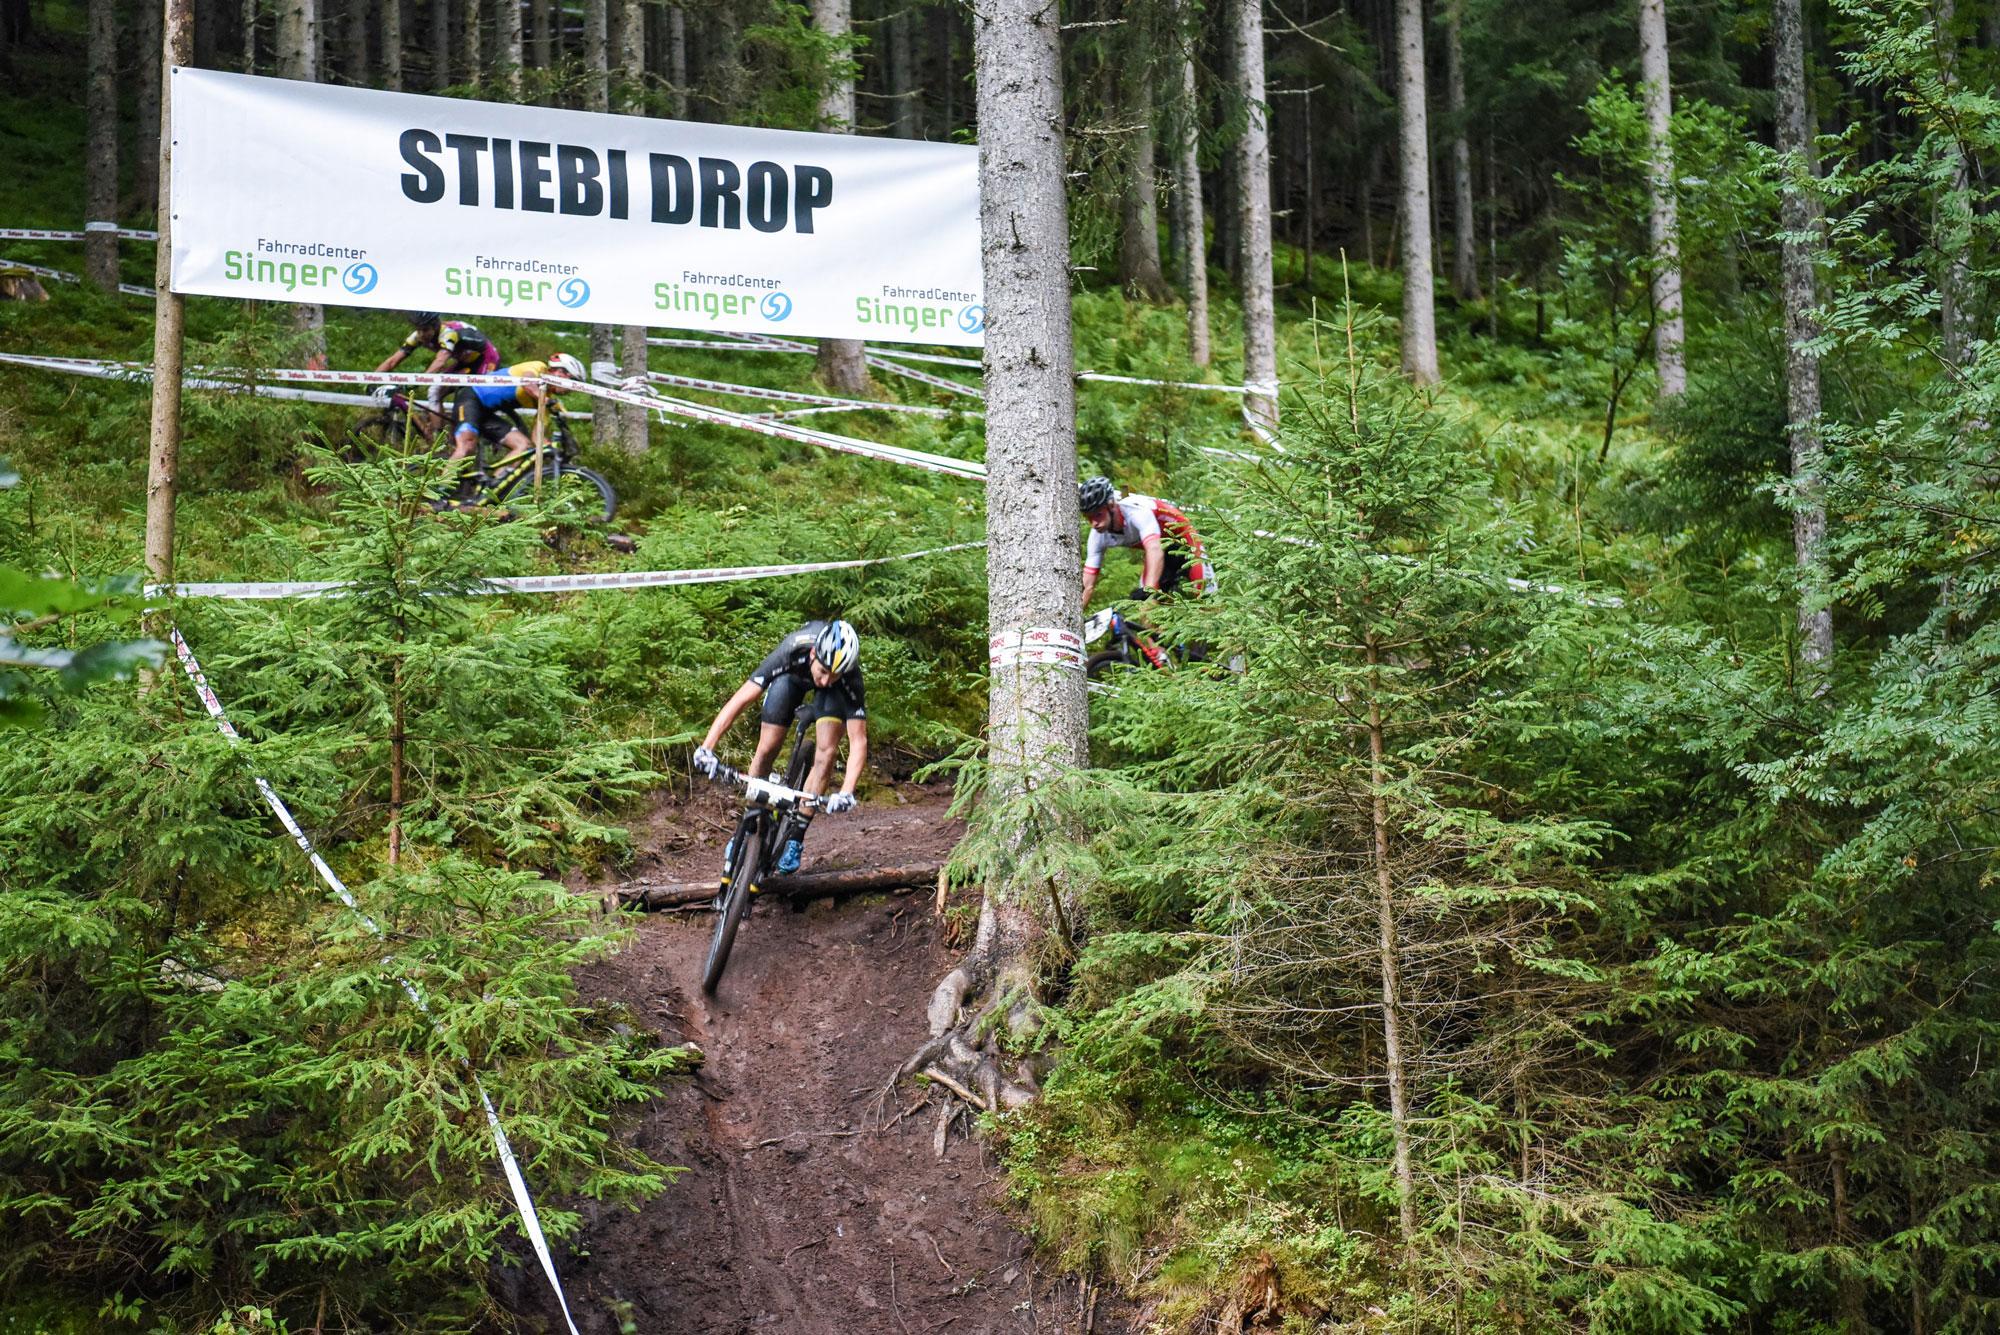 MTB Bundesliga - Stiebi Drop